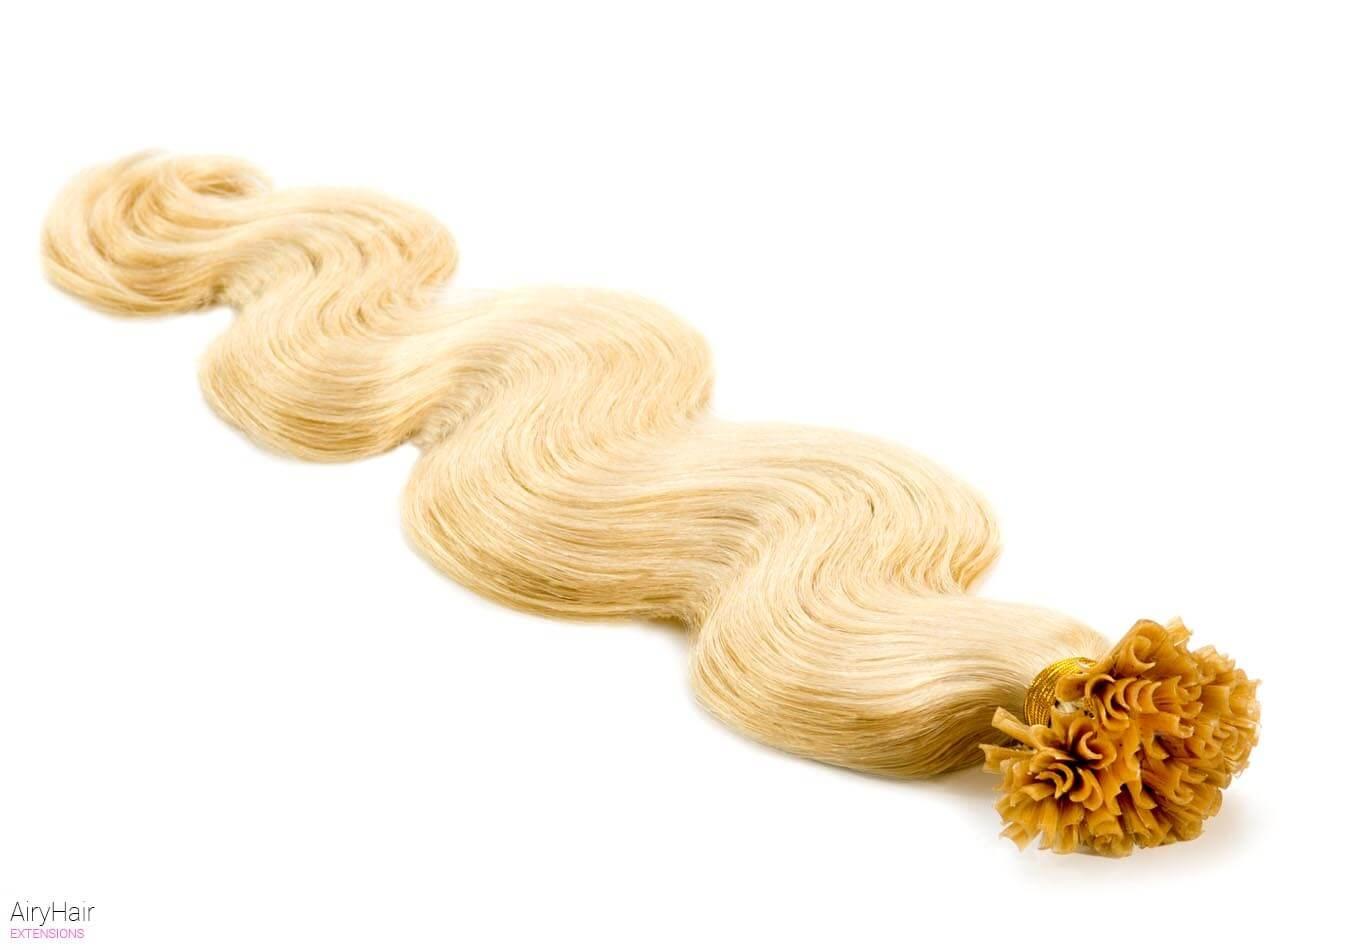 Glue In Artificial Body Wave Hair Extensions Airyhair